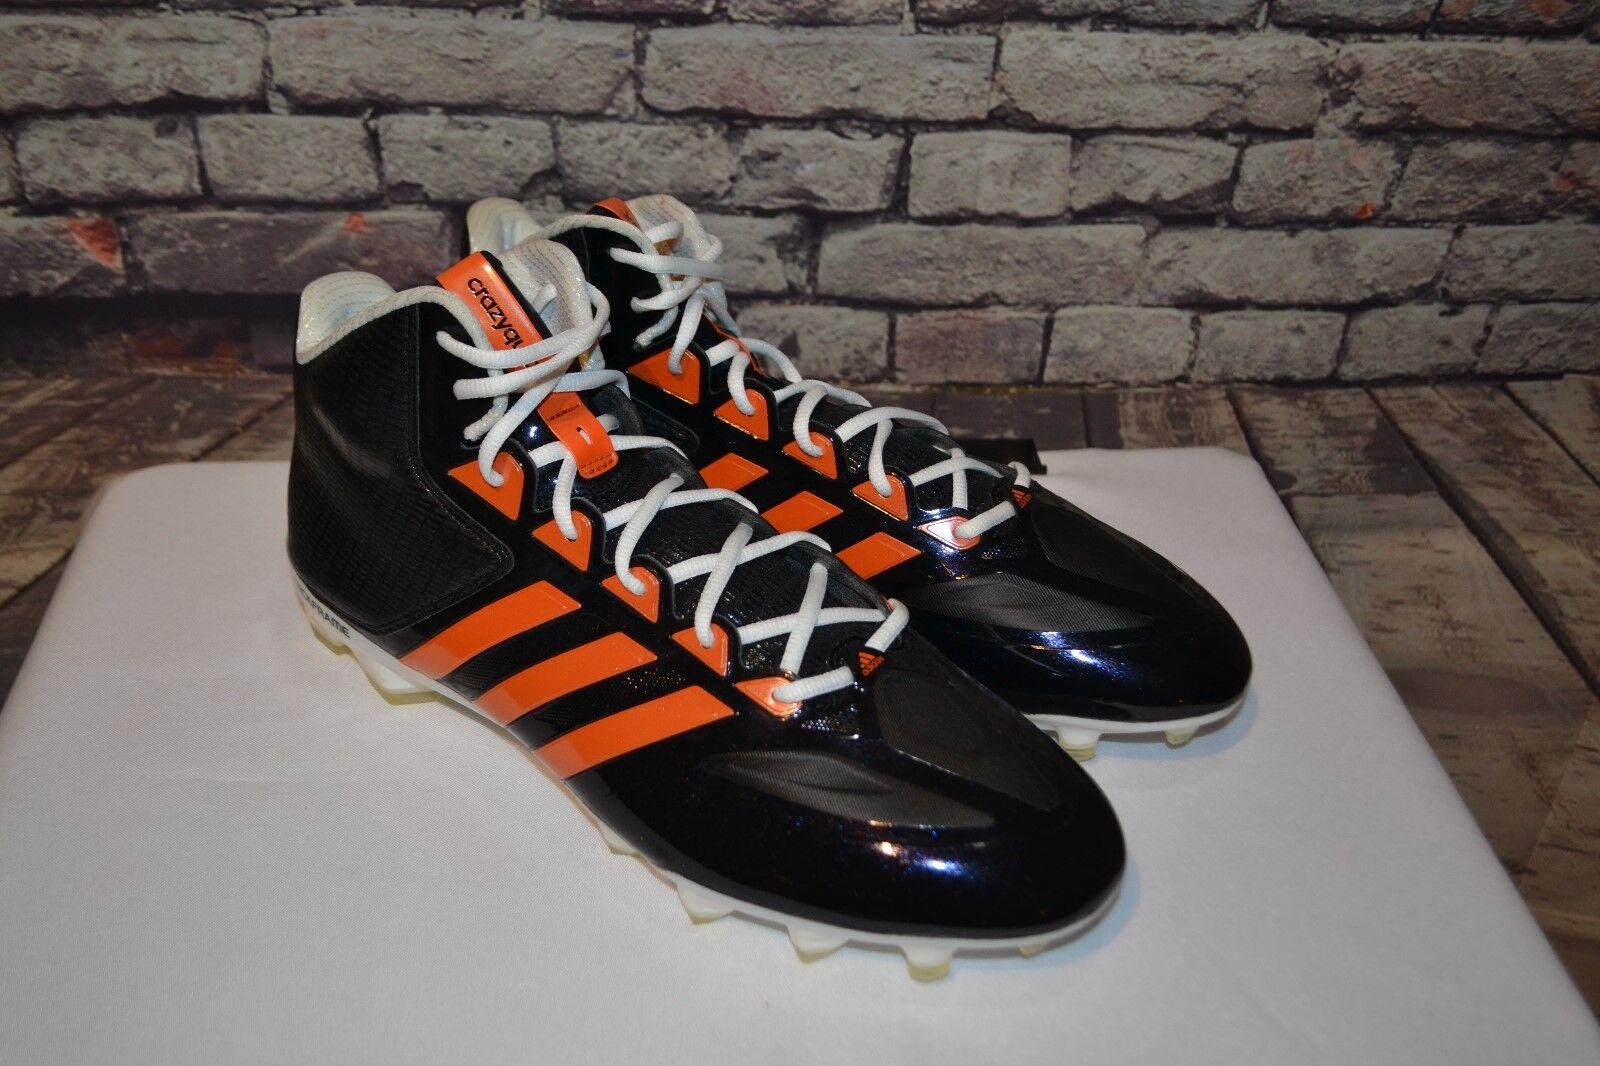 Adidas Football Cleats - Mens Sz 13 - NWOB